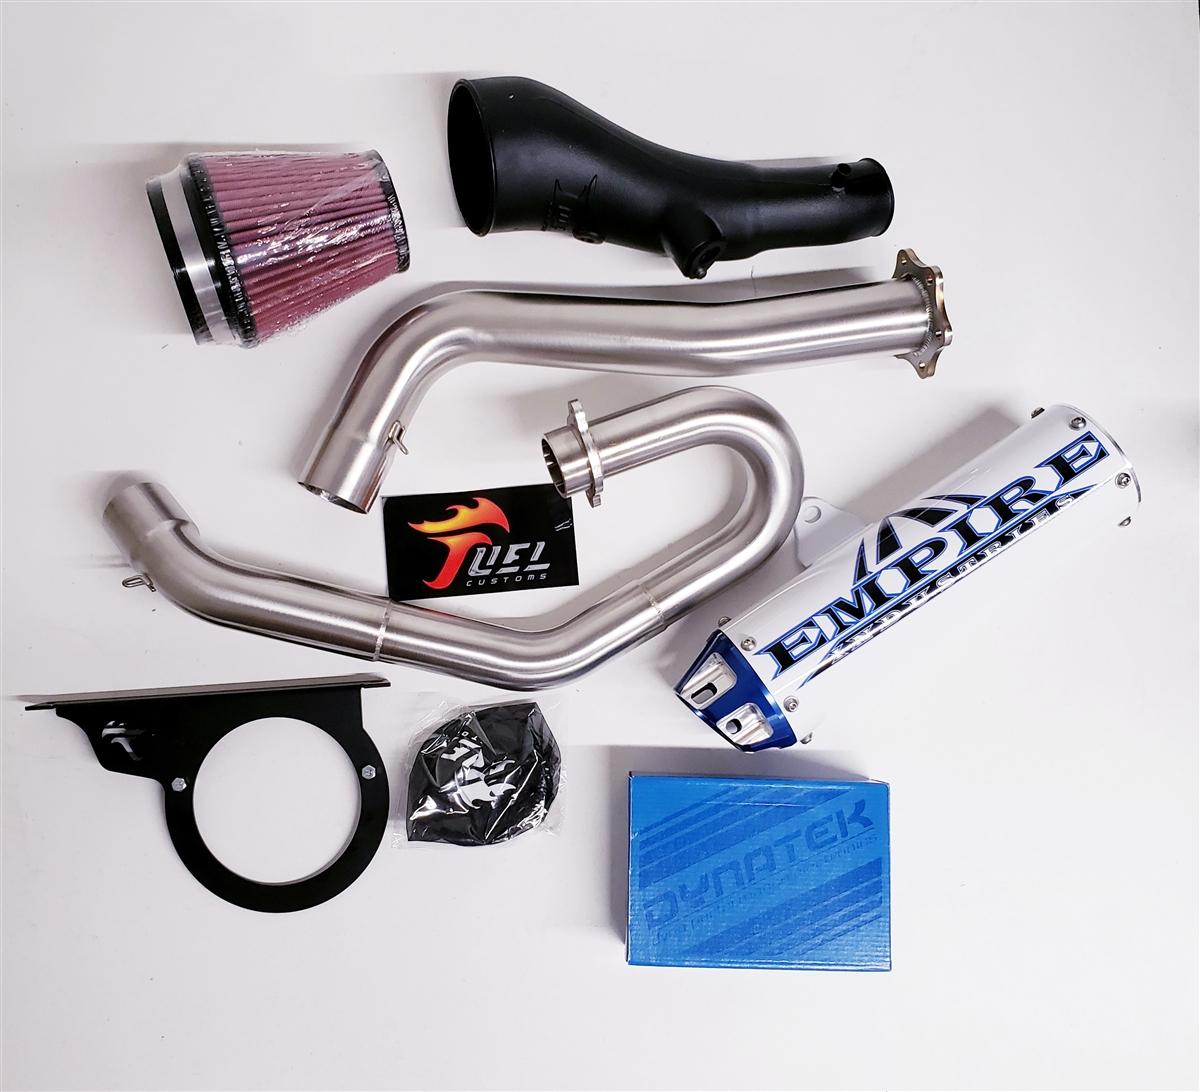 Empire Industries Gen 2 15-19 Yamaha Raptor 700 Big 3 Power Package